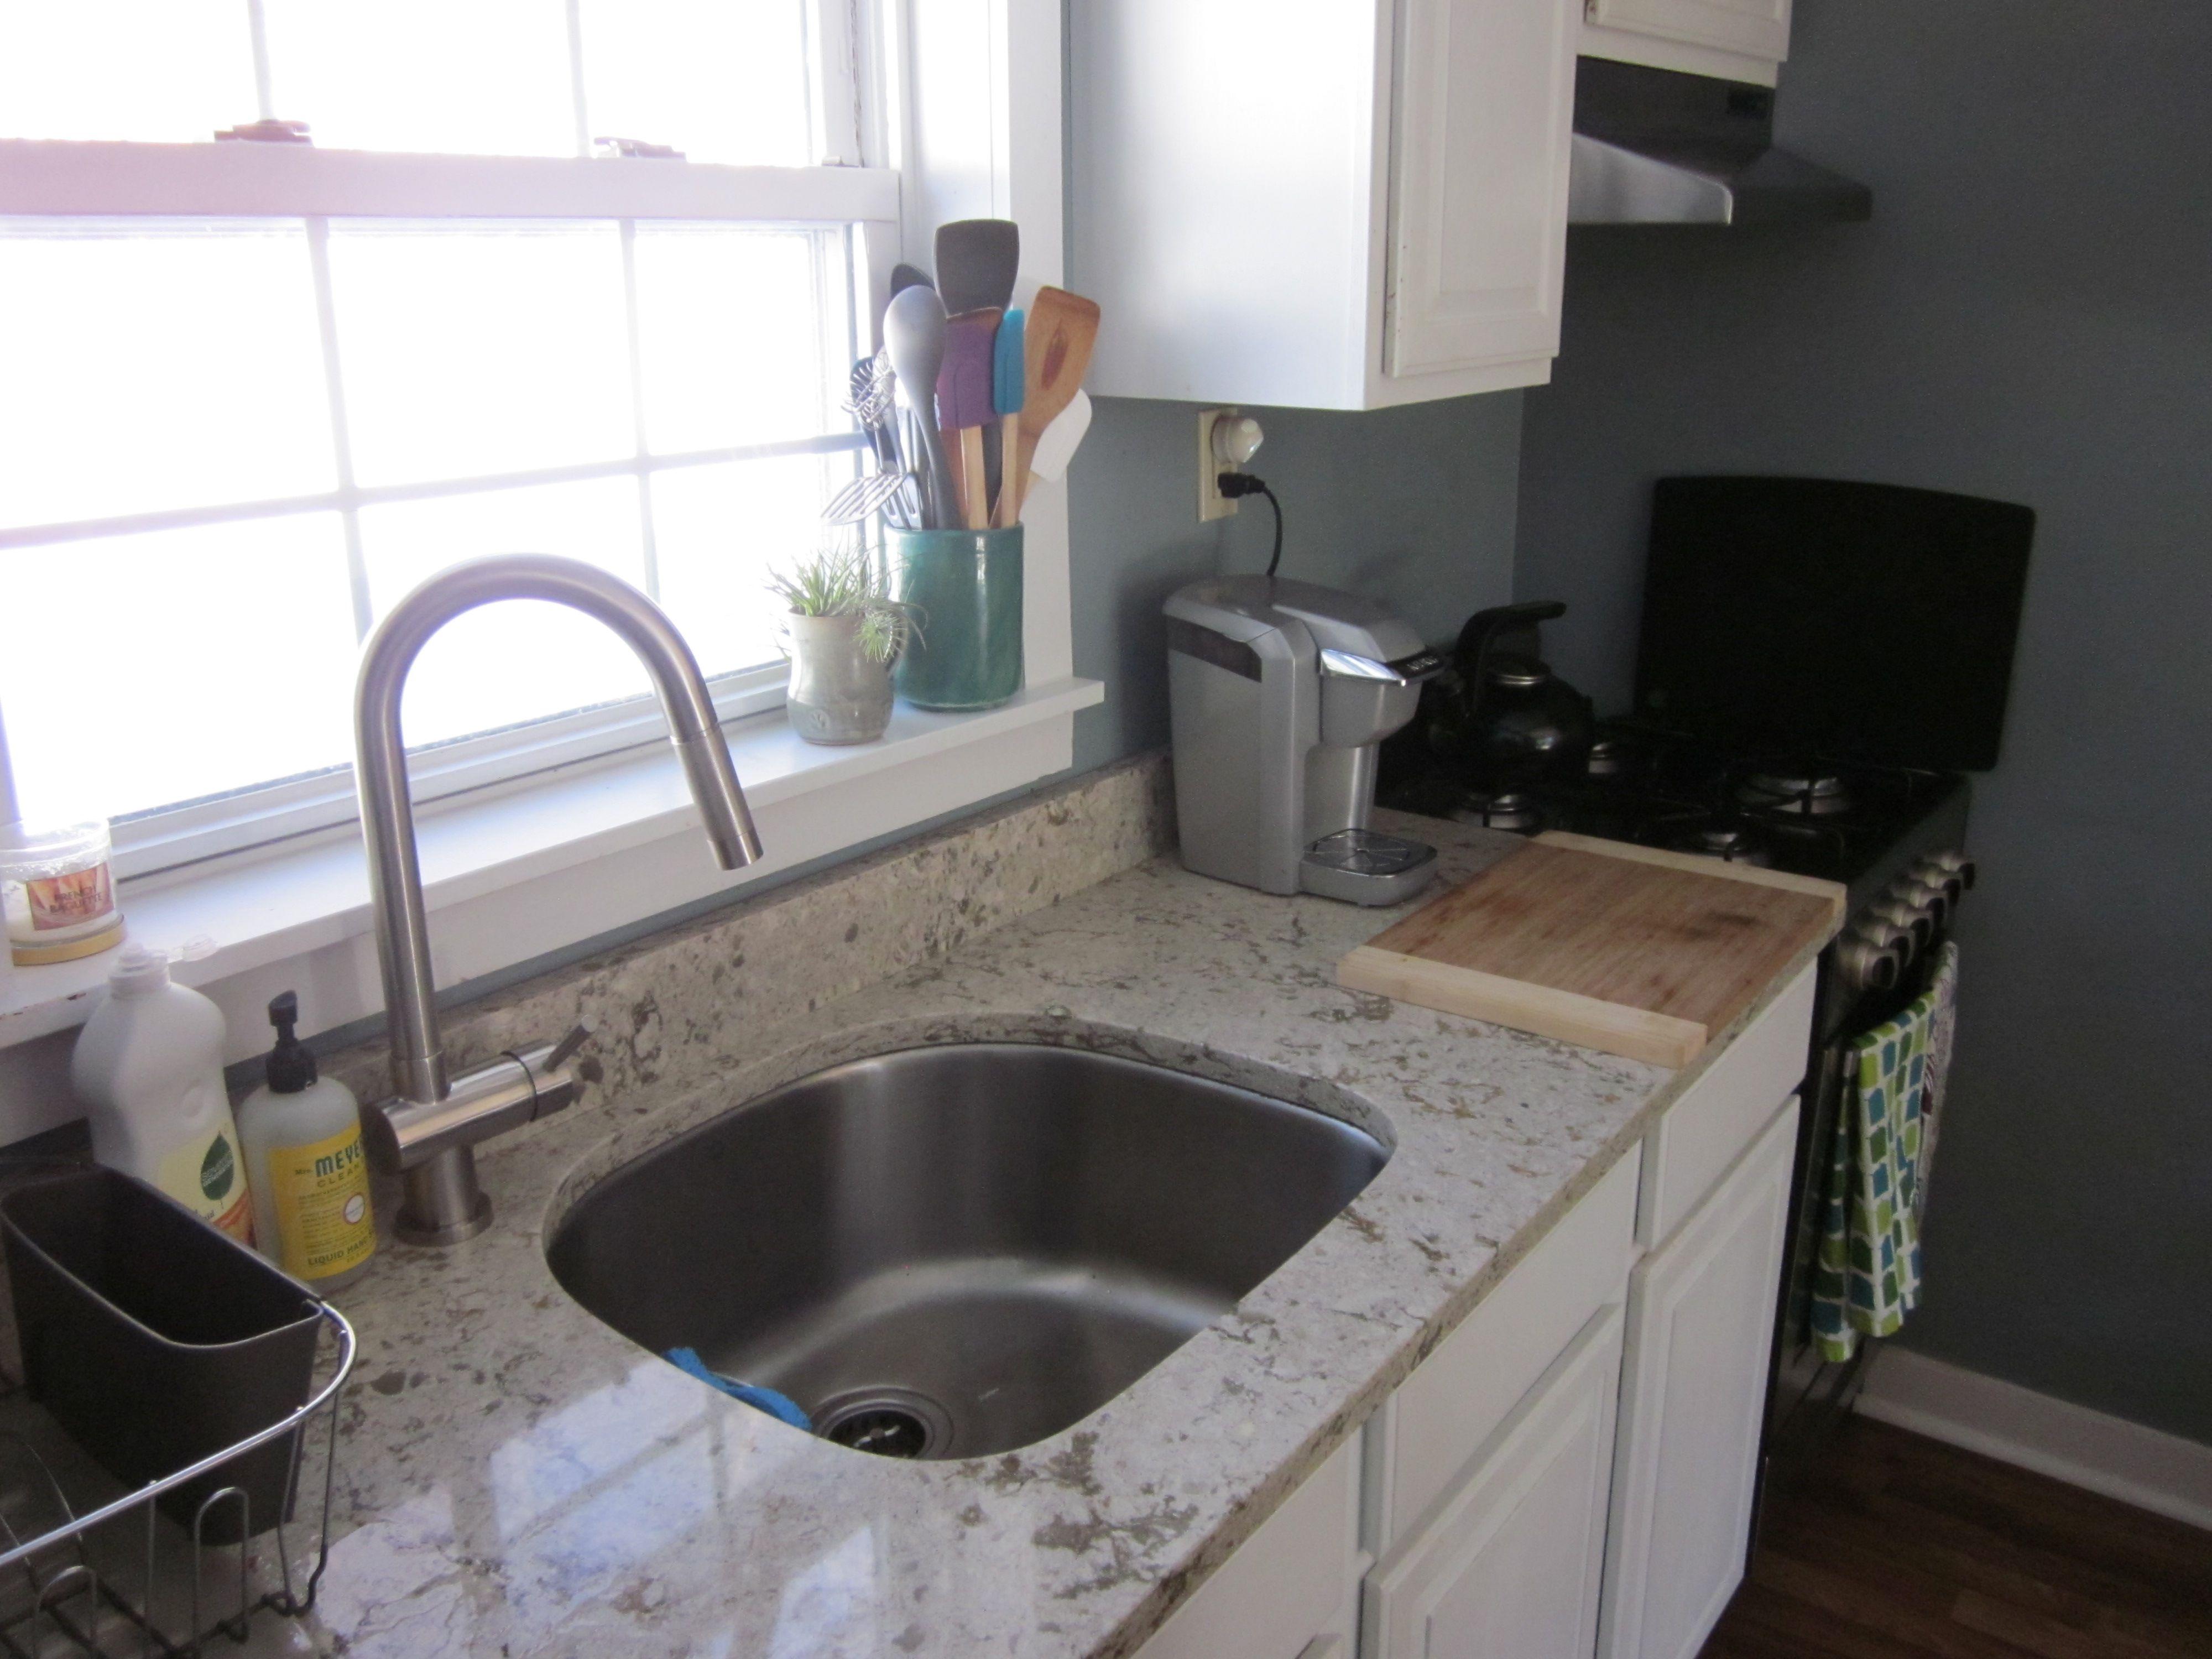 Bathroom Undermount Sink And Faucet cambria quartz countertop in windermere, vigo faucet and